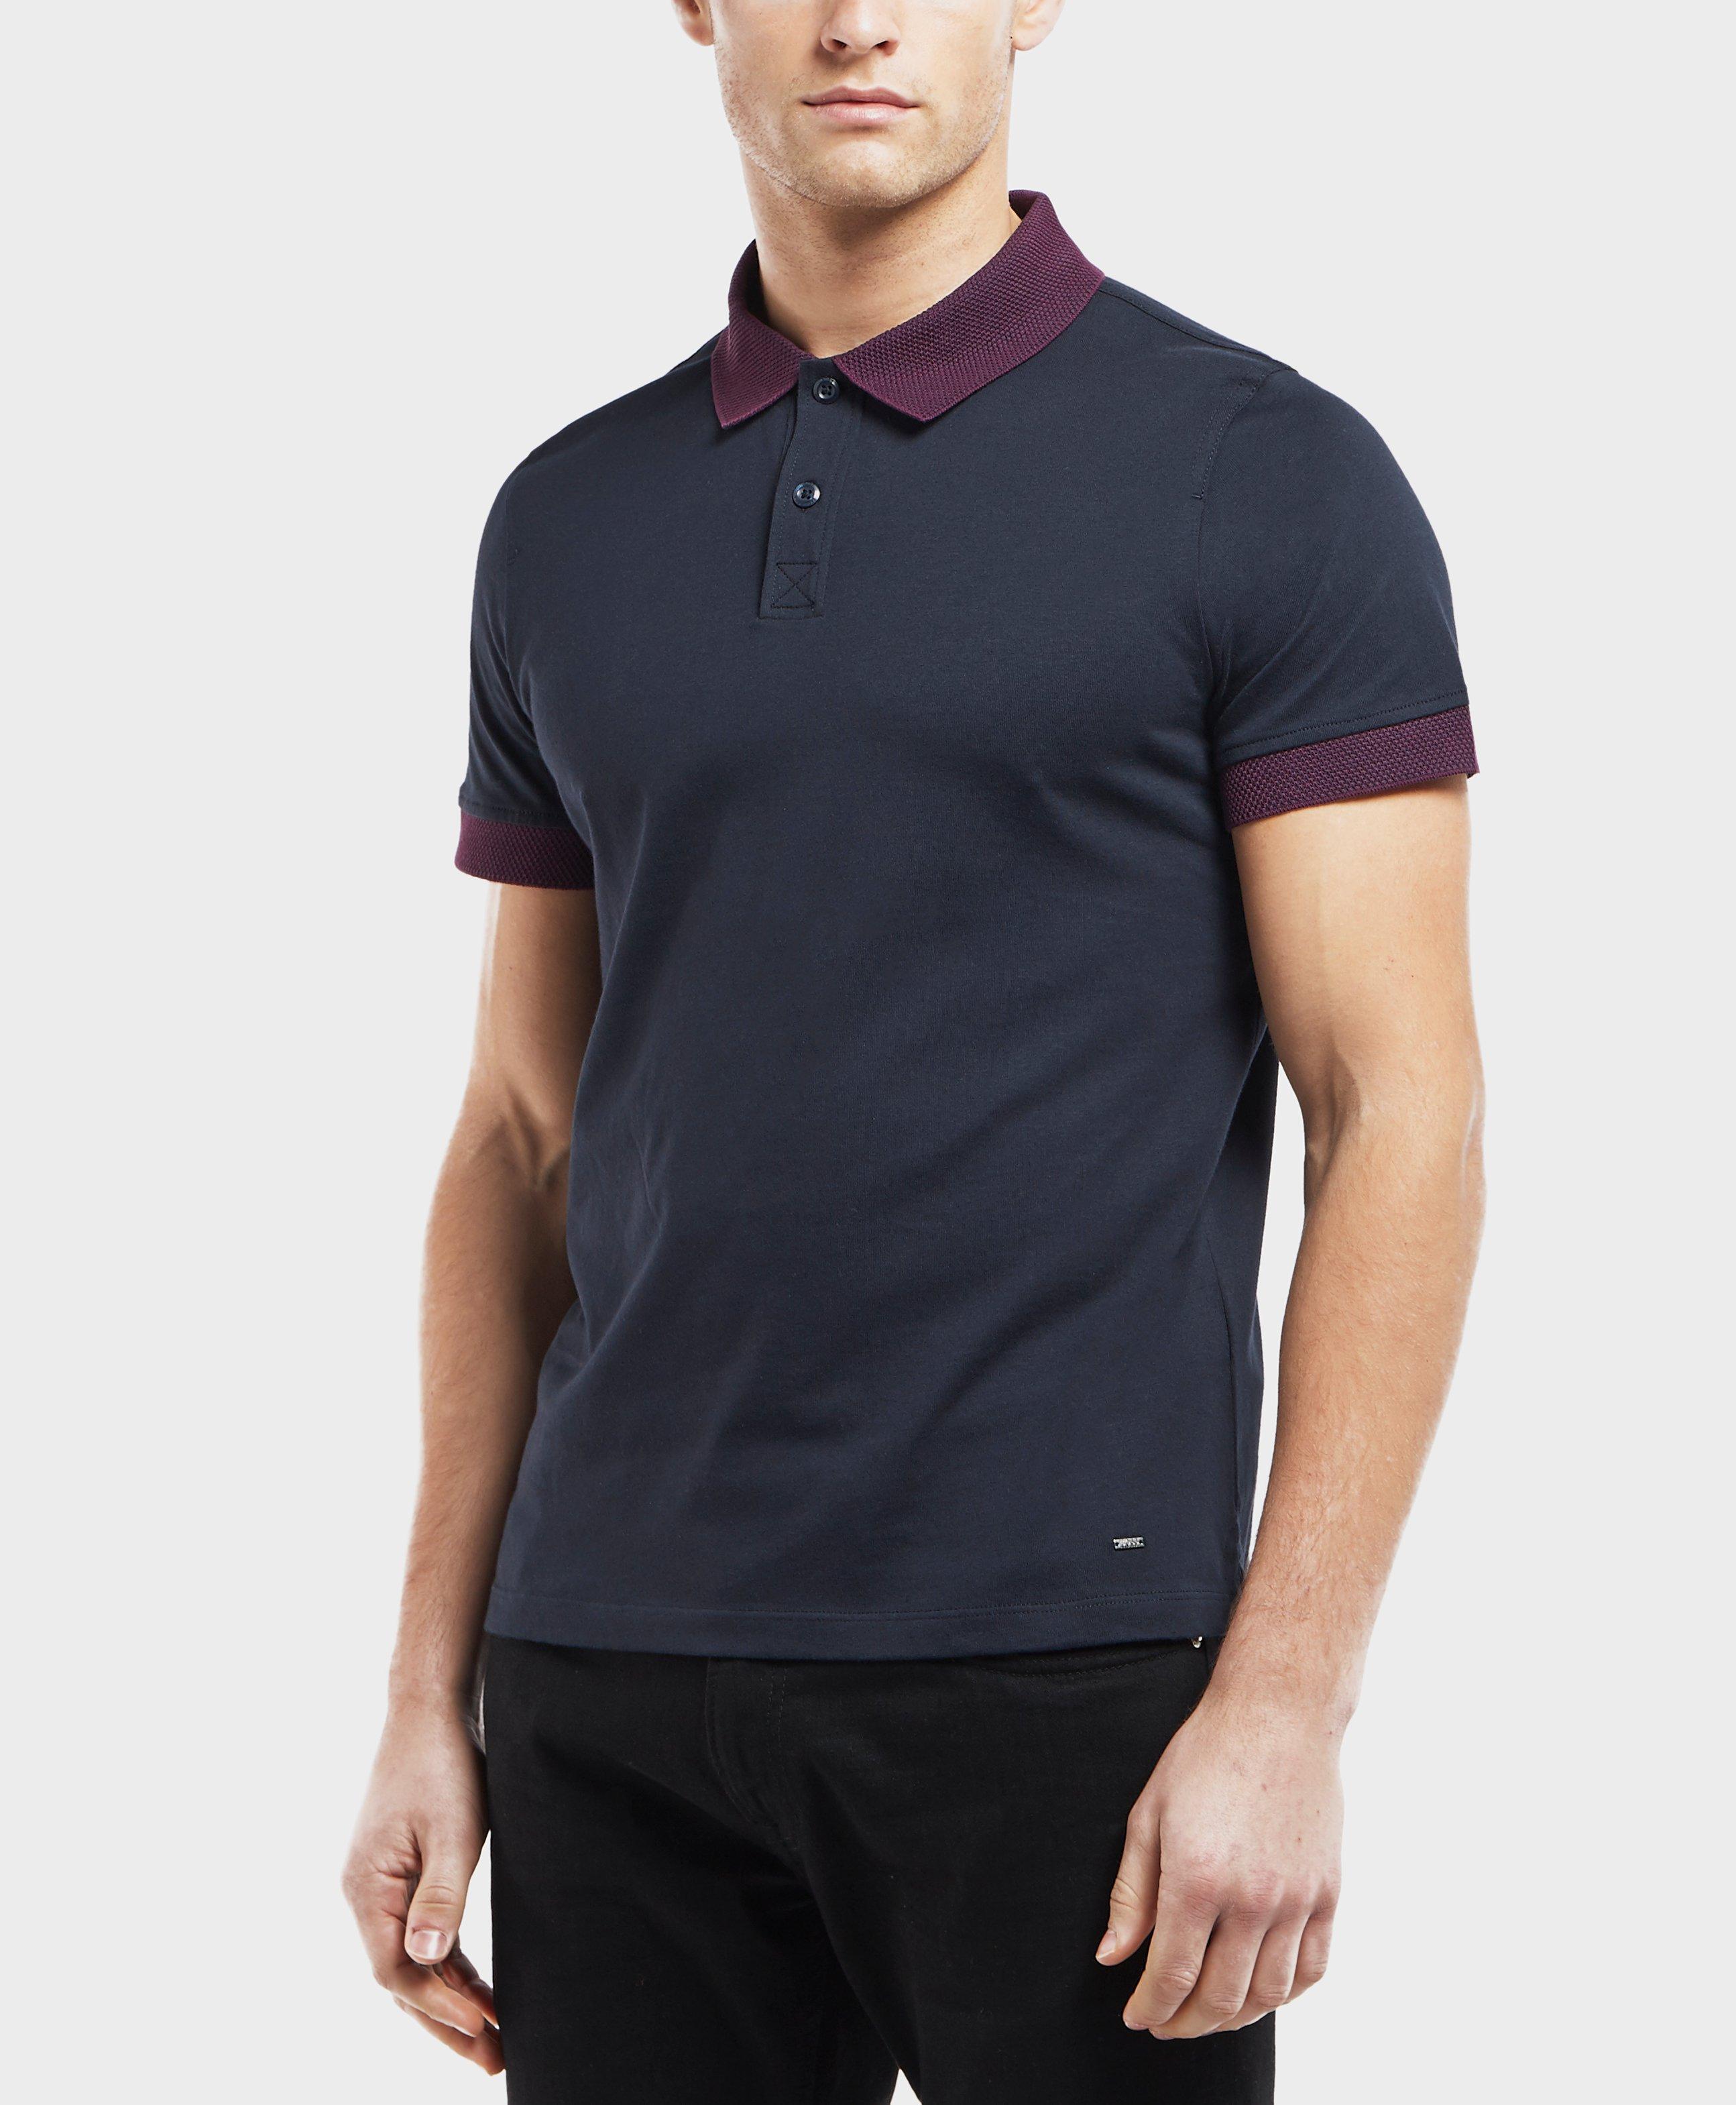 373942db9 Boss Contrast Collar Short Sleeve Polo Shirt in Blue for Men - Lyst